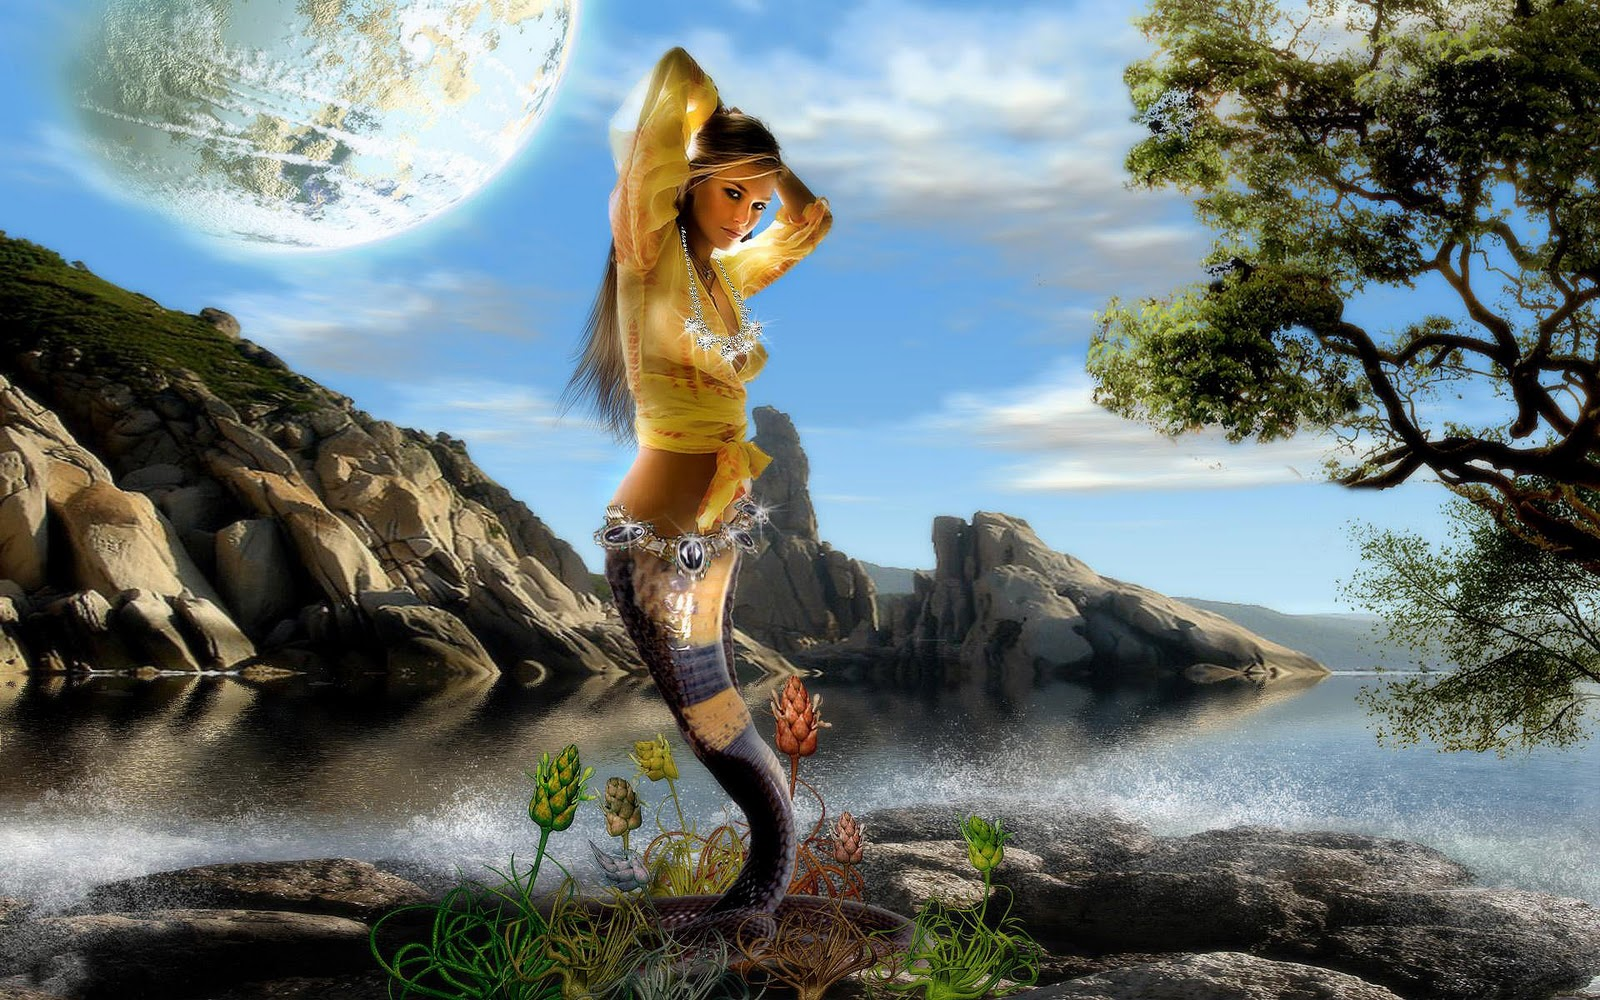 Stunning Hd Fantasy Gaming Desktop Wallpapers: TOP WORLD PIC: Fantasy Wallpapers